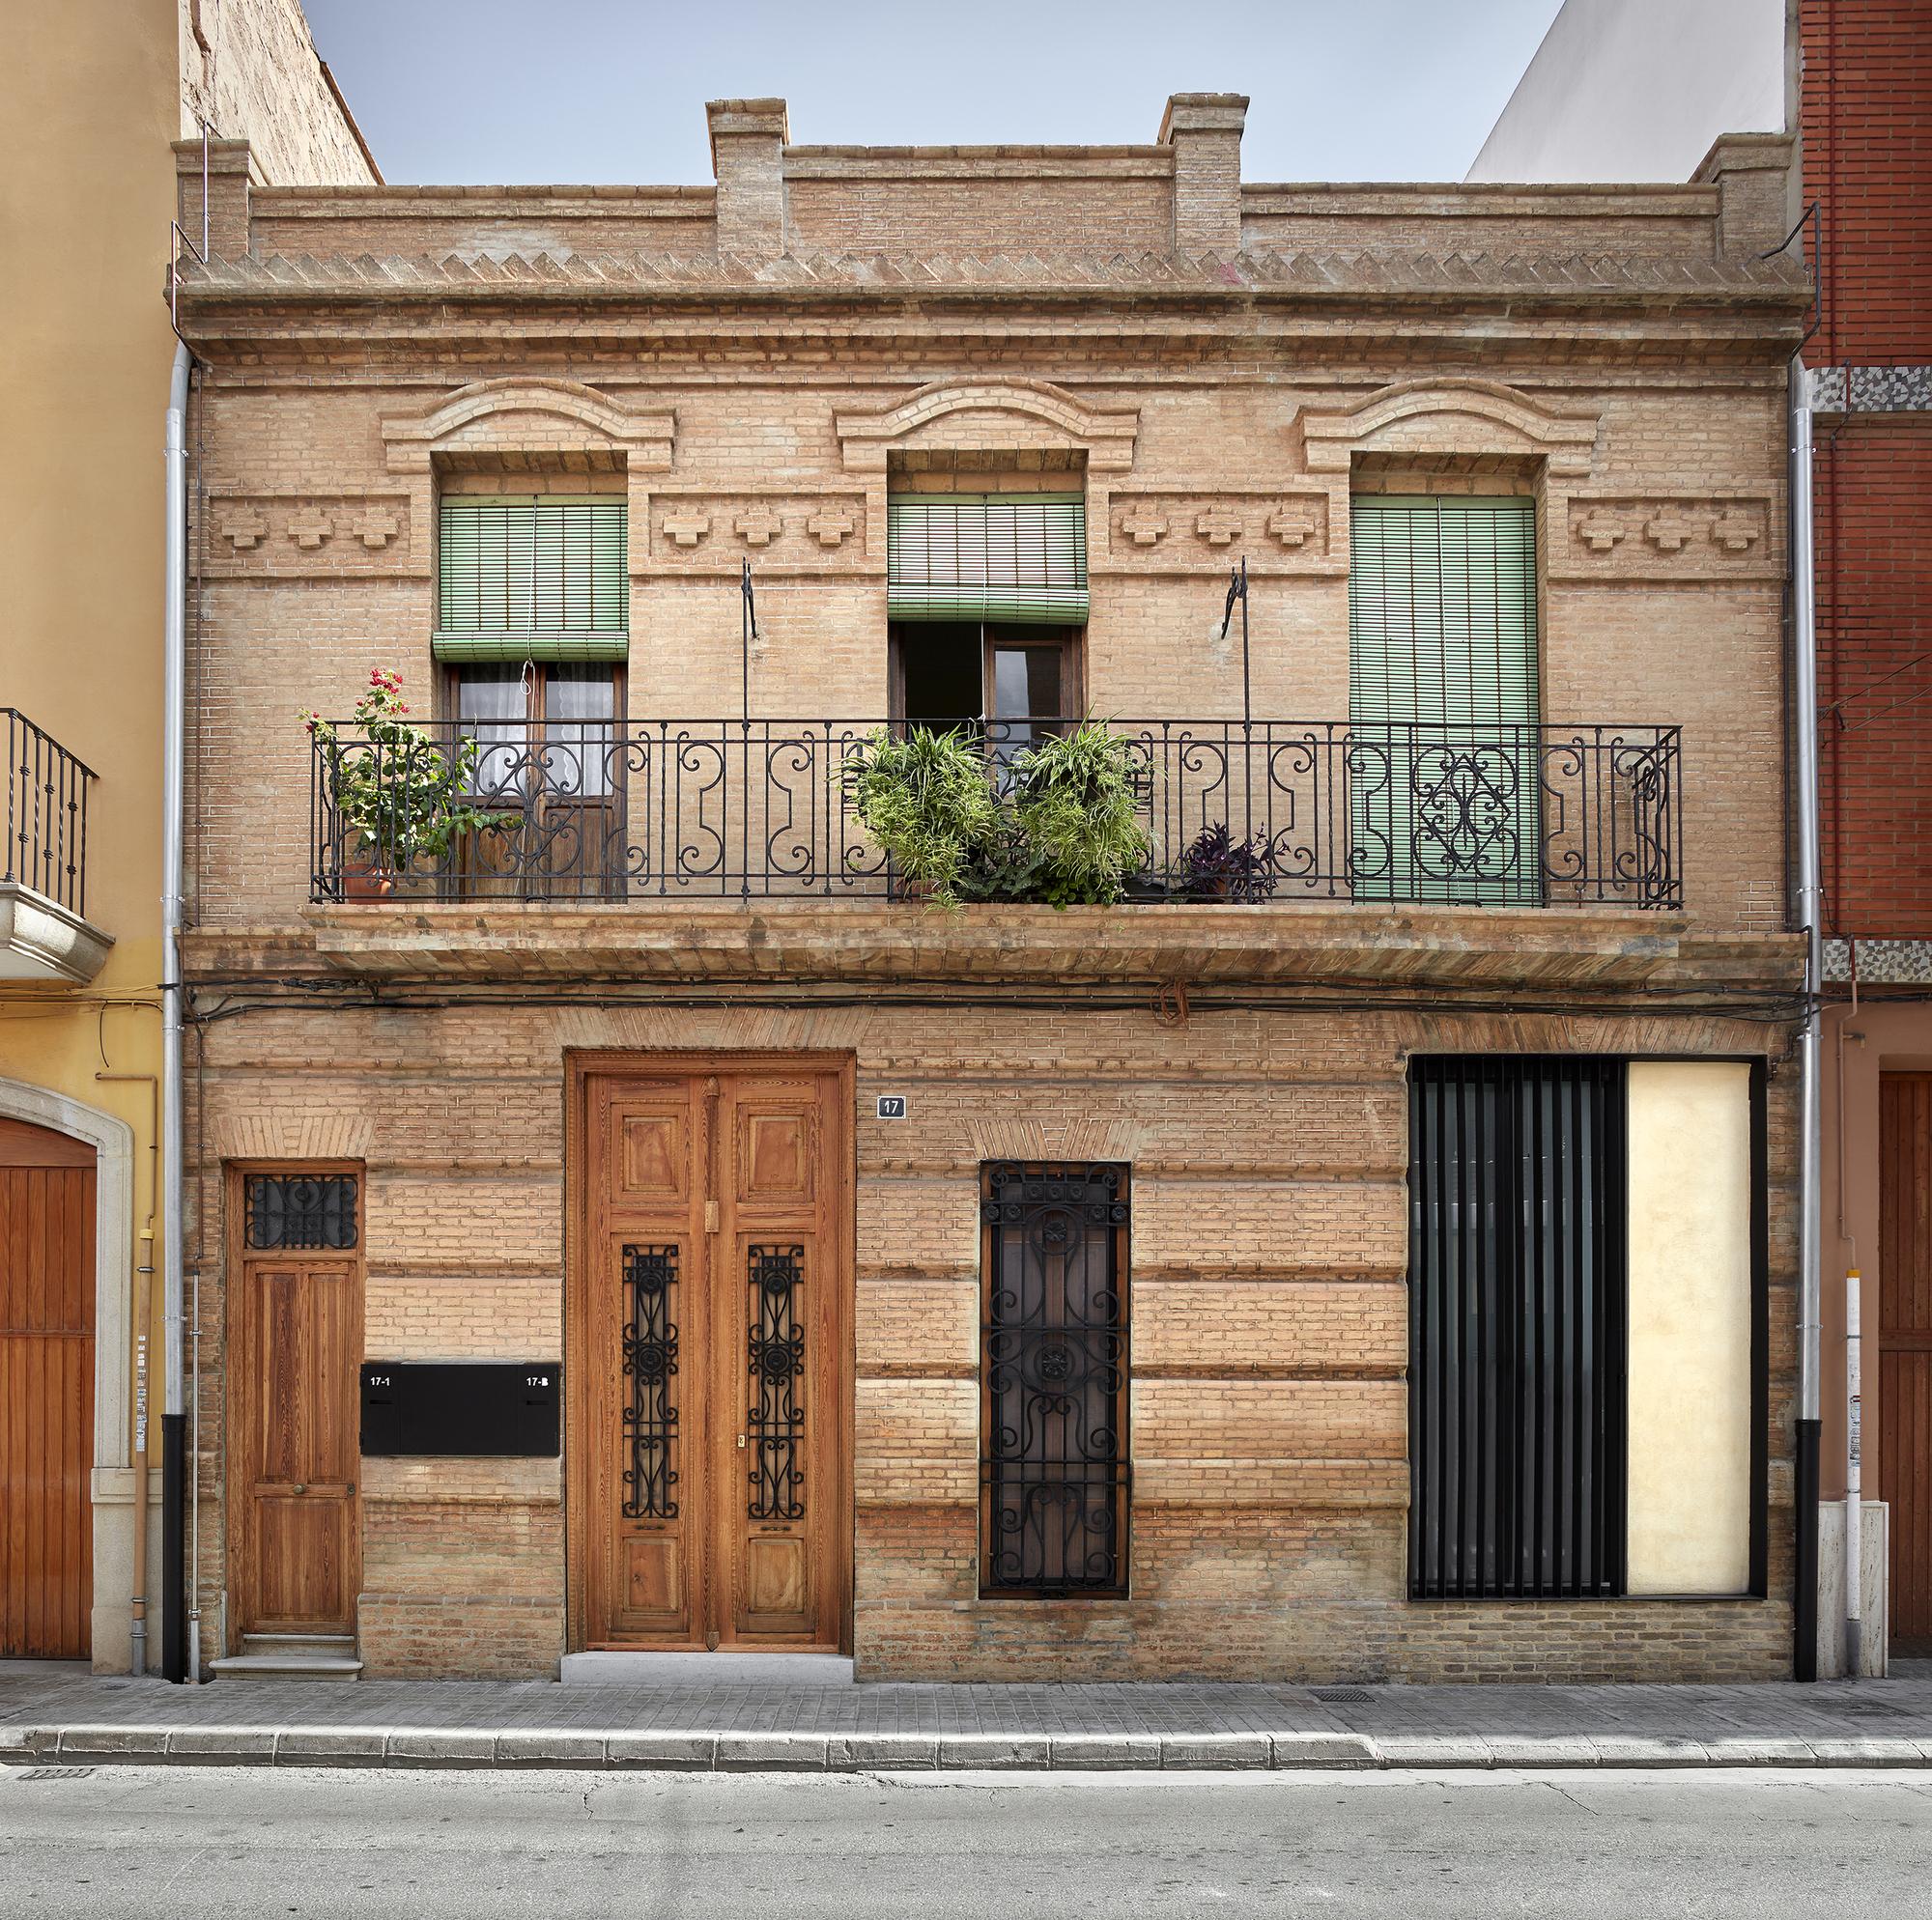 House Rehabilitation in Valencia / DG Arquitecto Valencia